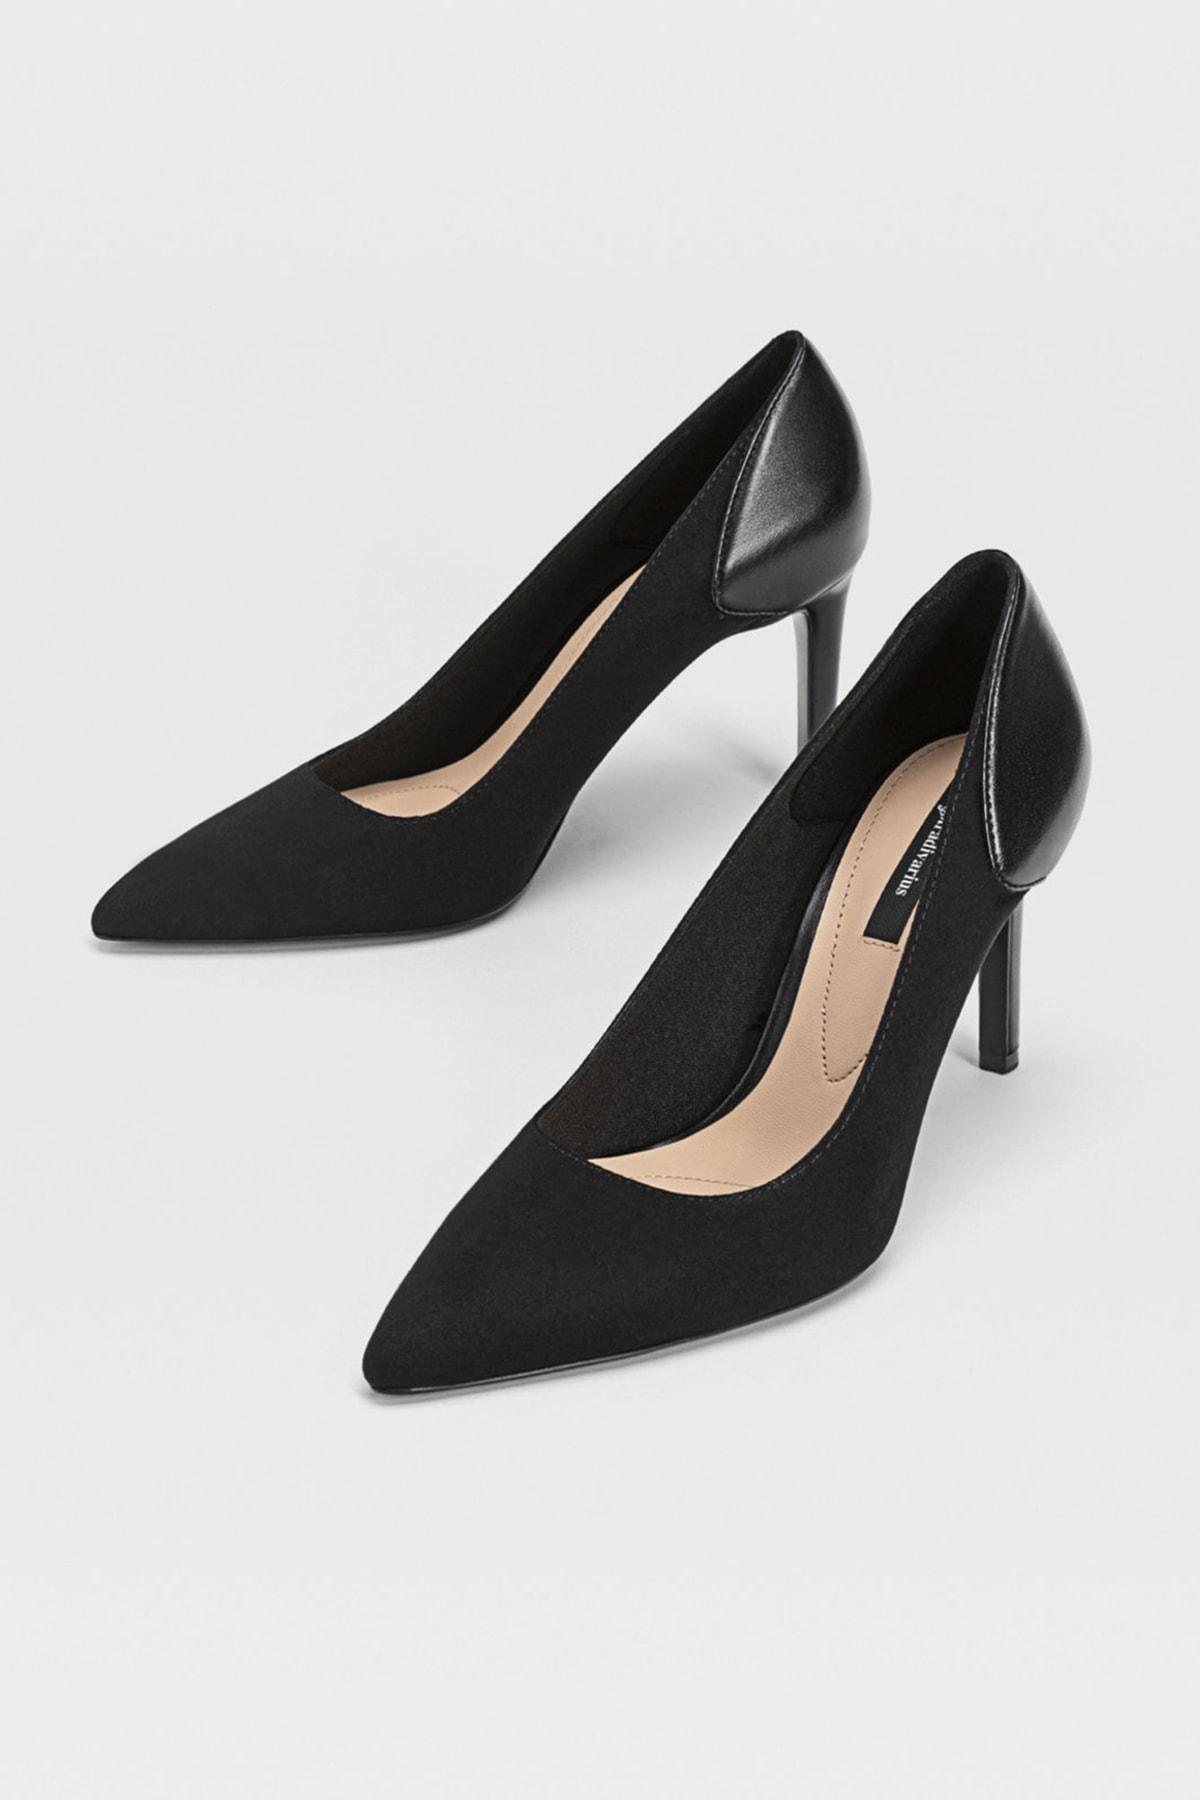 Stradivarius Kadın Siyah Yüksek Topuklu Kontrast Ayakkabı 19650670 2